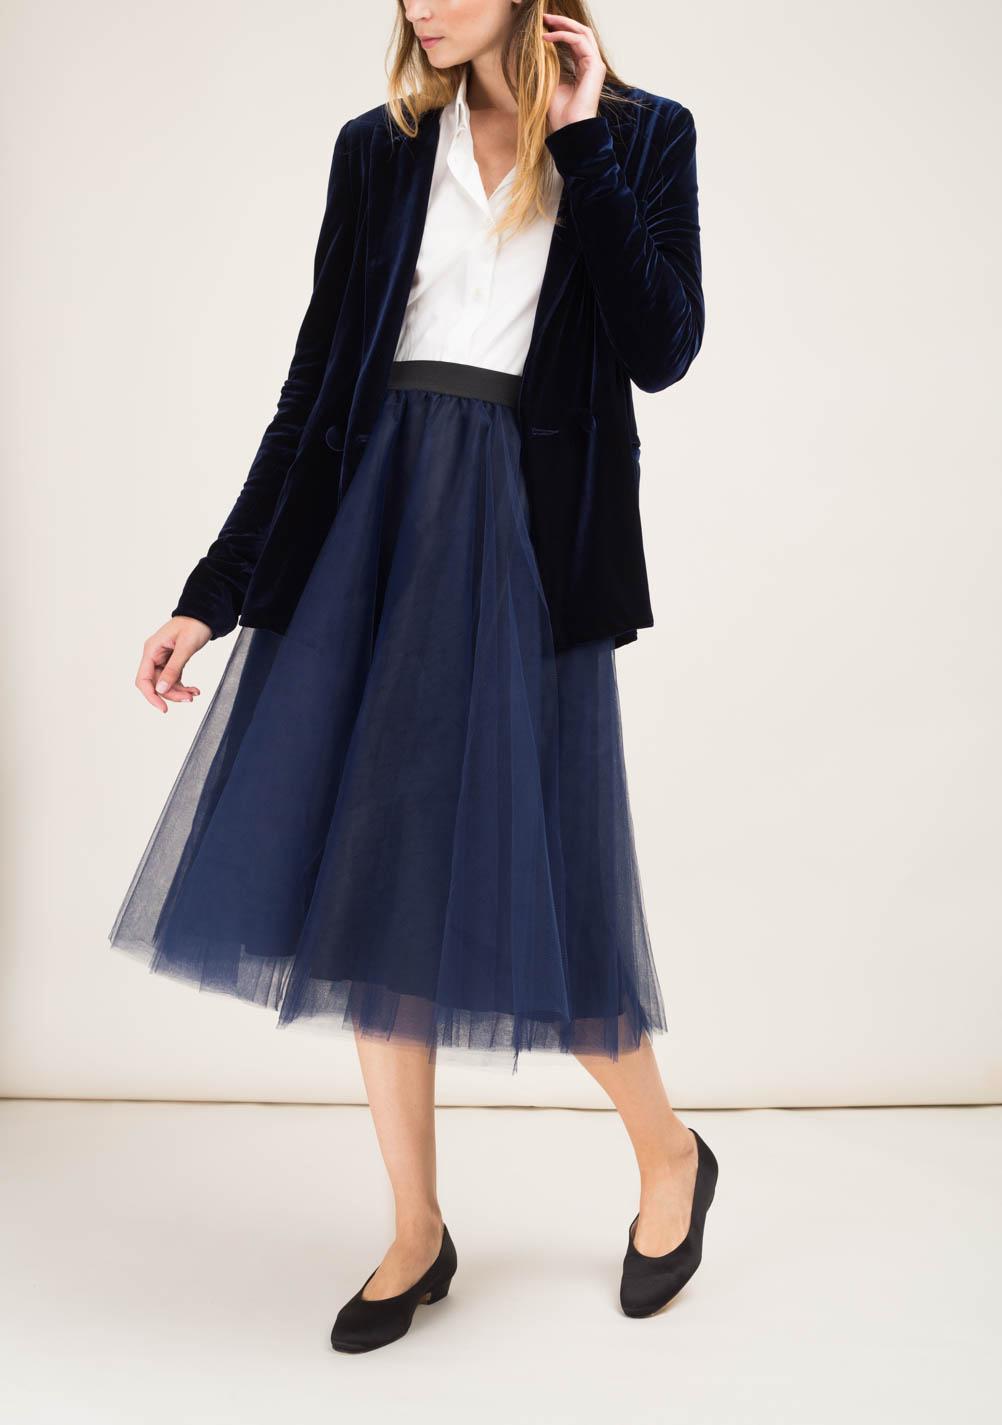 finest selection 25438 650b3 MATTA E GOLDONI - Midi ballerina skirt in tulle - The ...